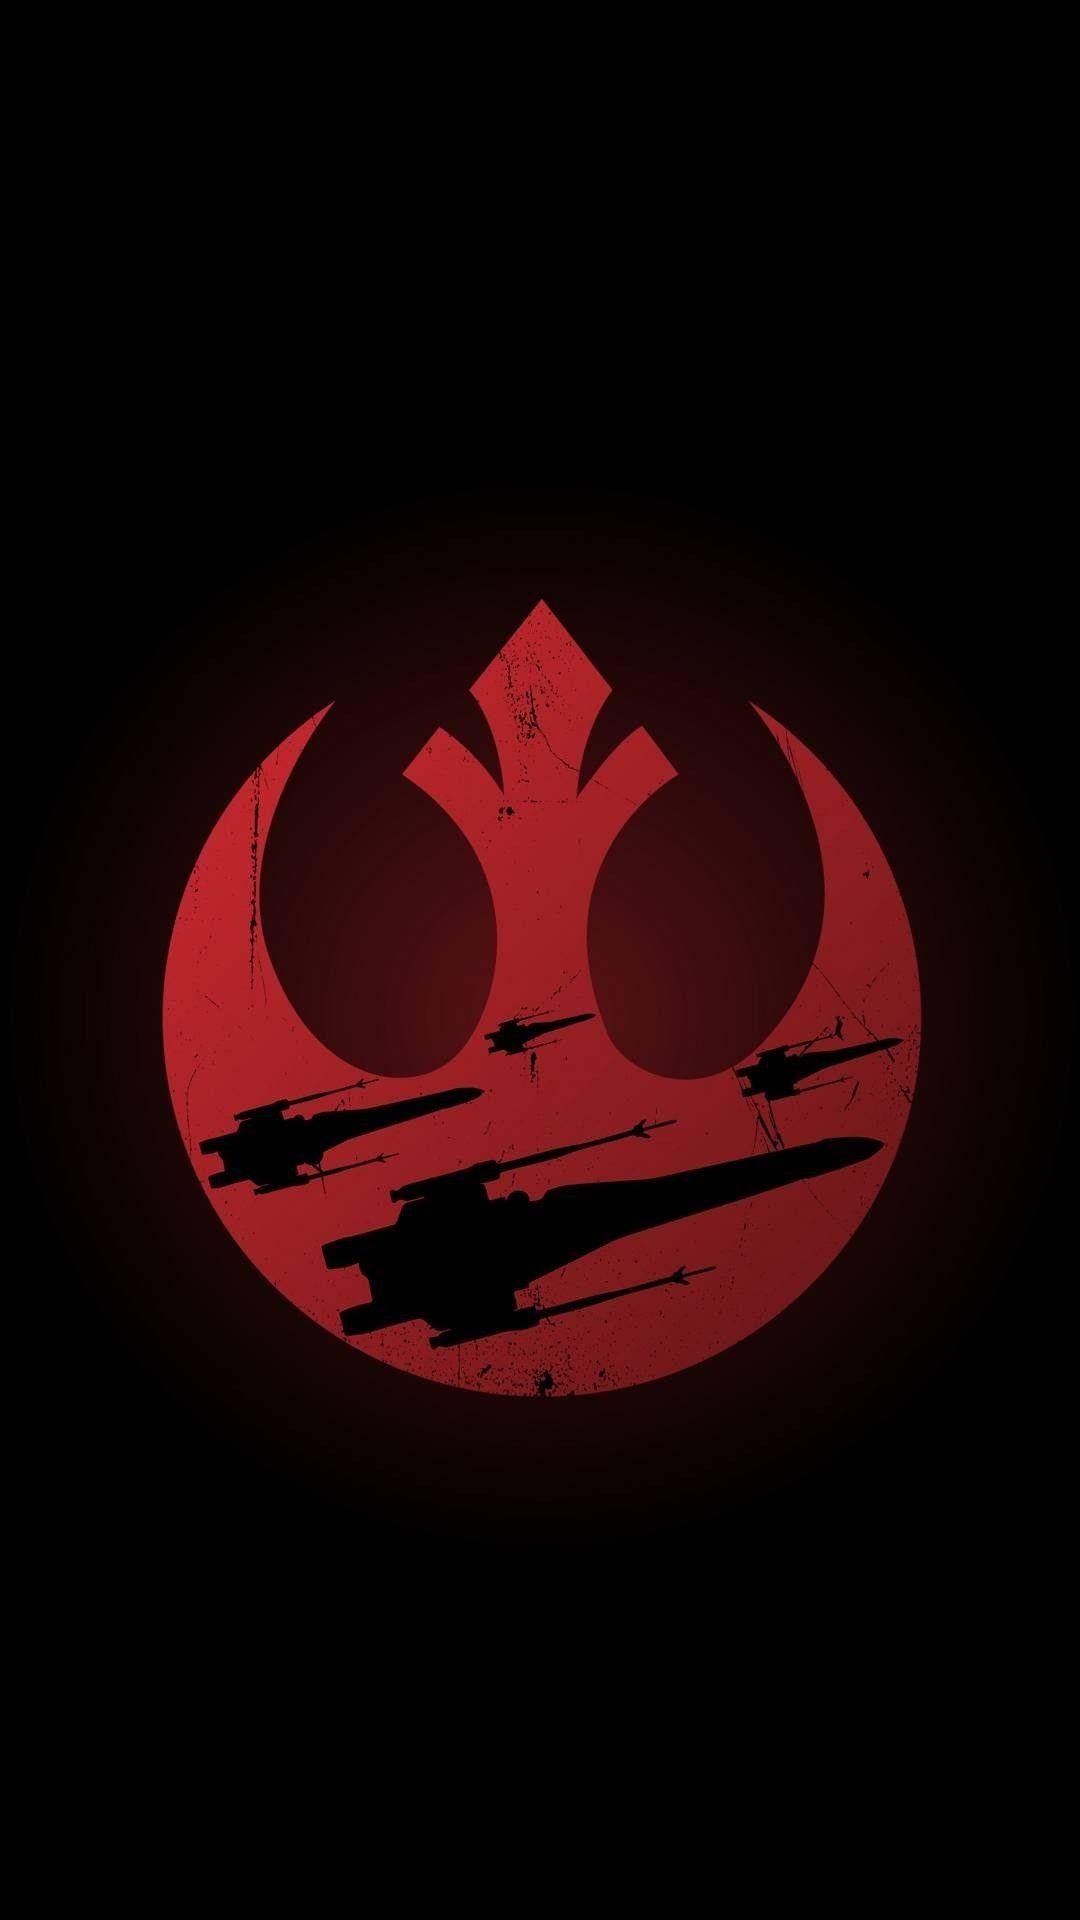 Star Wars Jedi Symbol Wallpaper (74+ pictures)